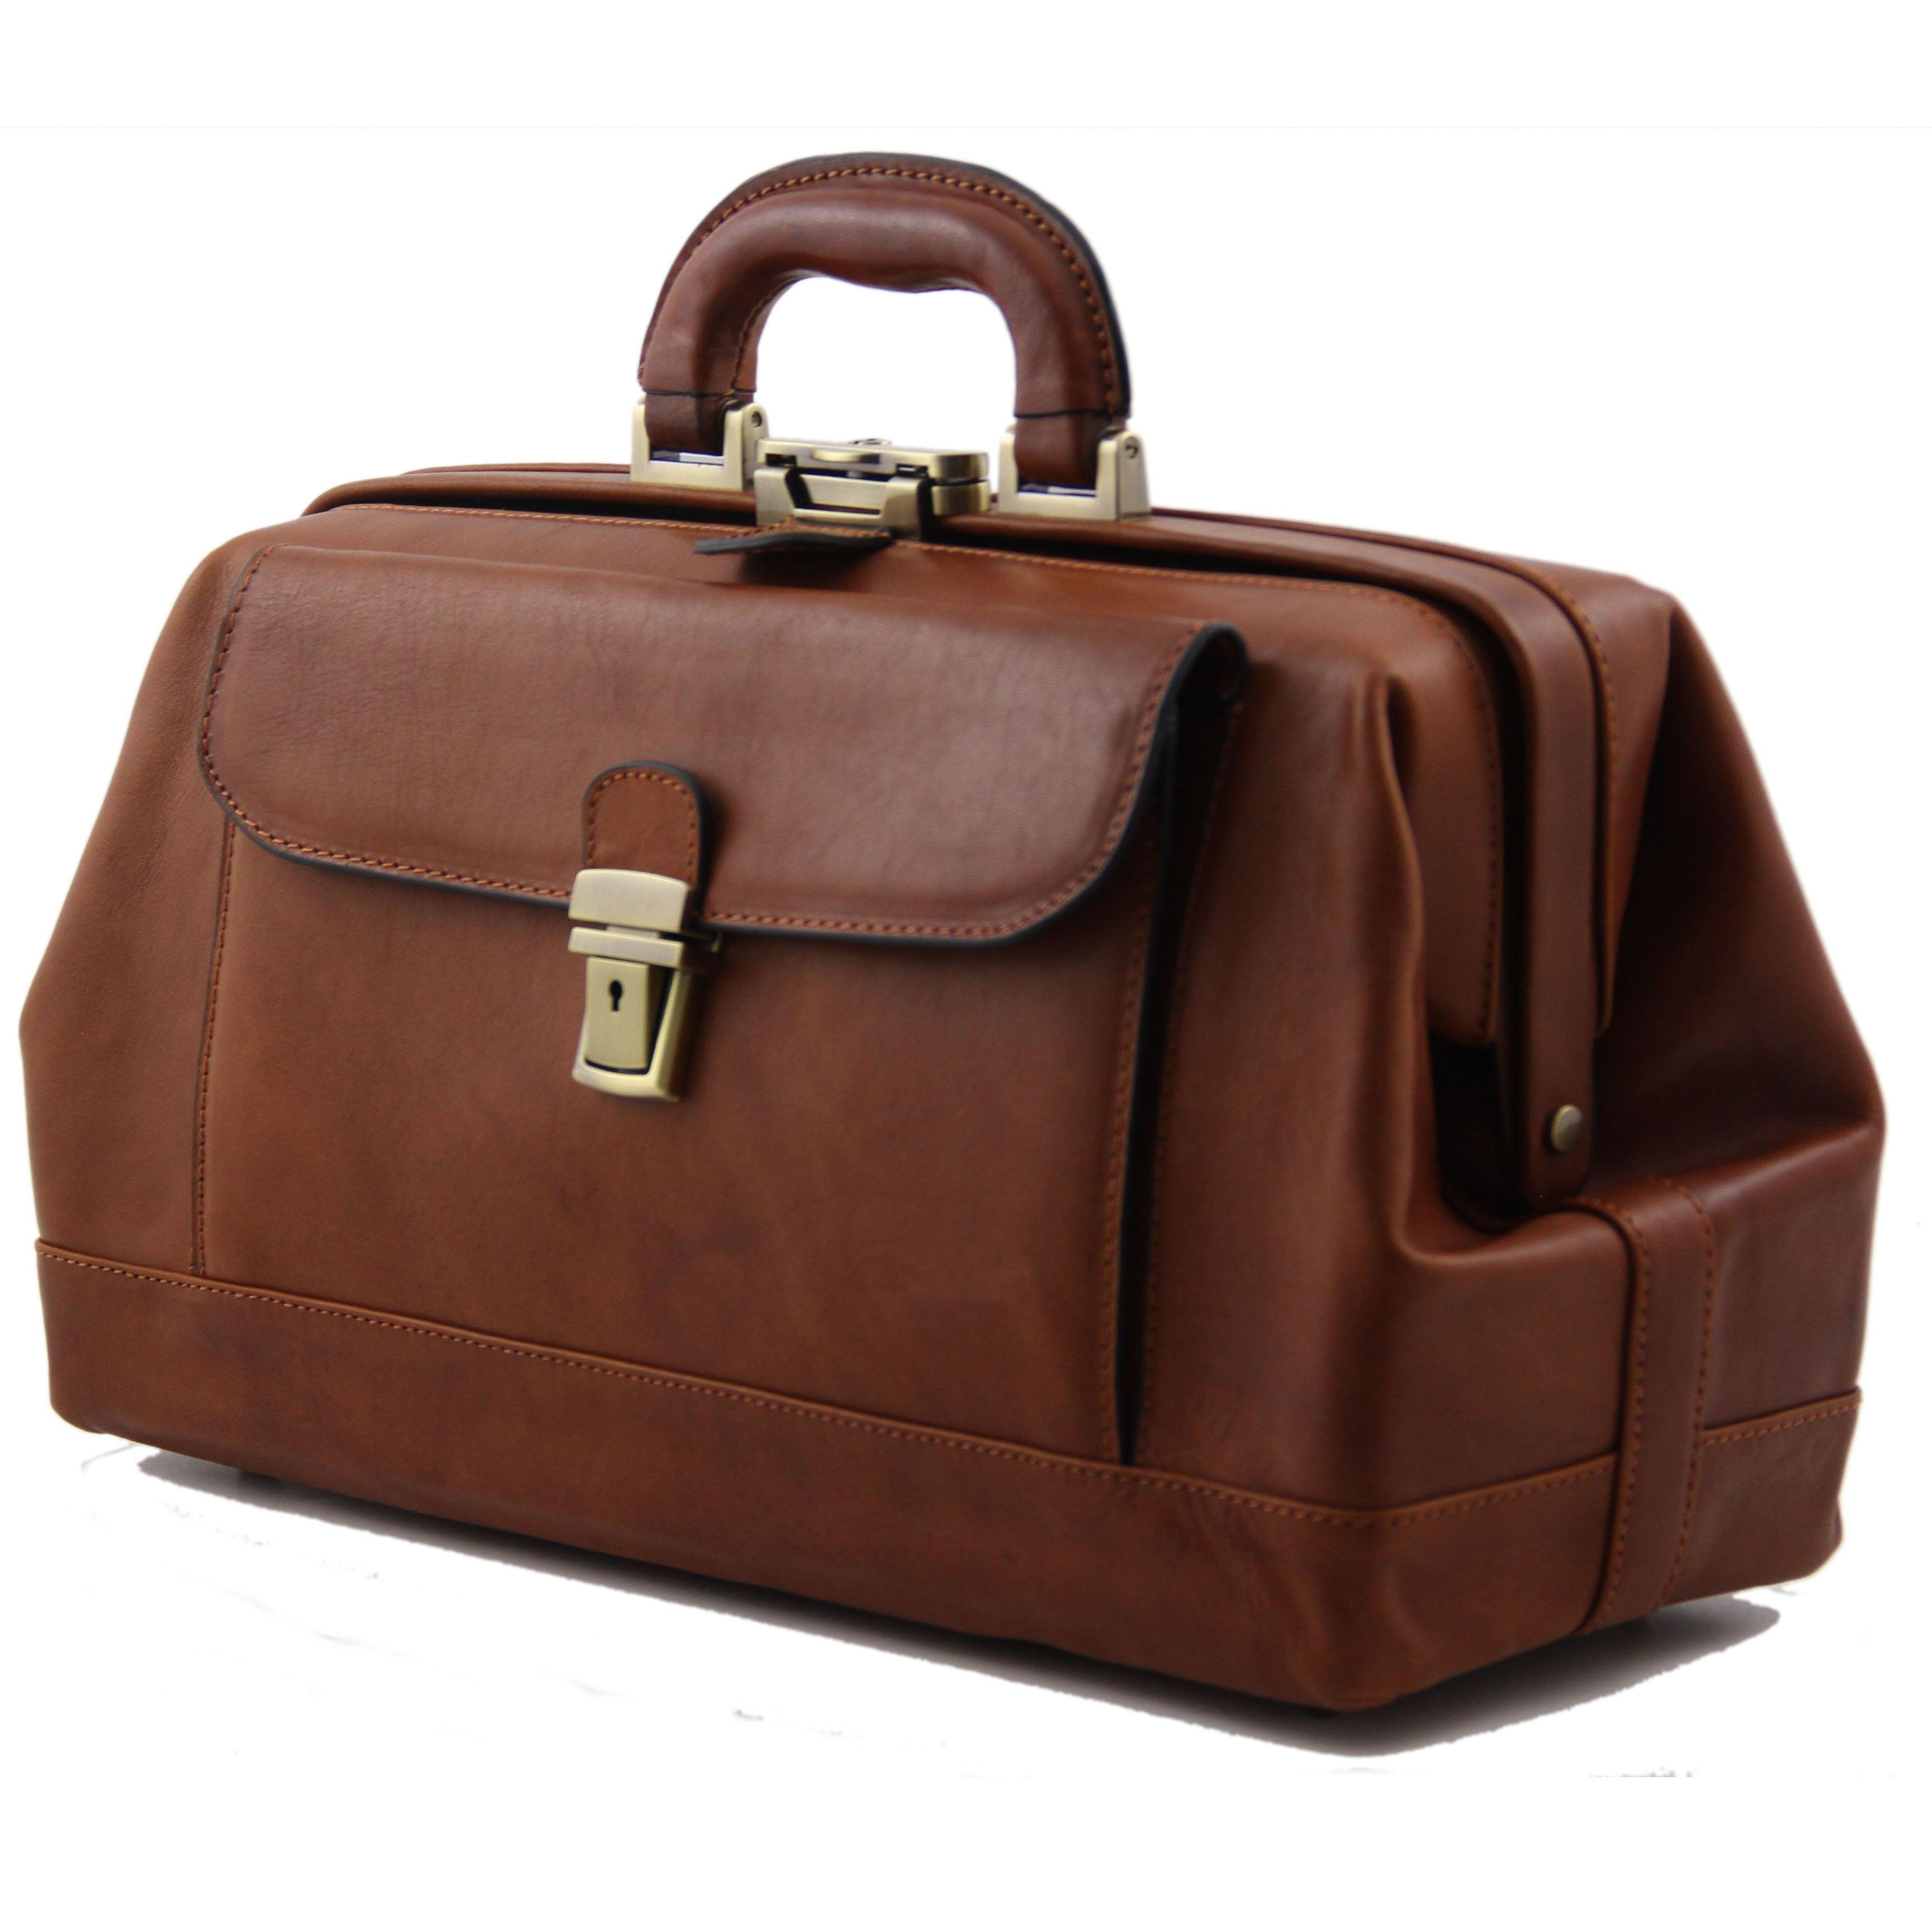 Alberto Bellucci Monaco Exclusive Leather Doctor Bag